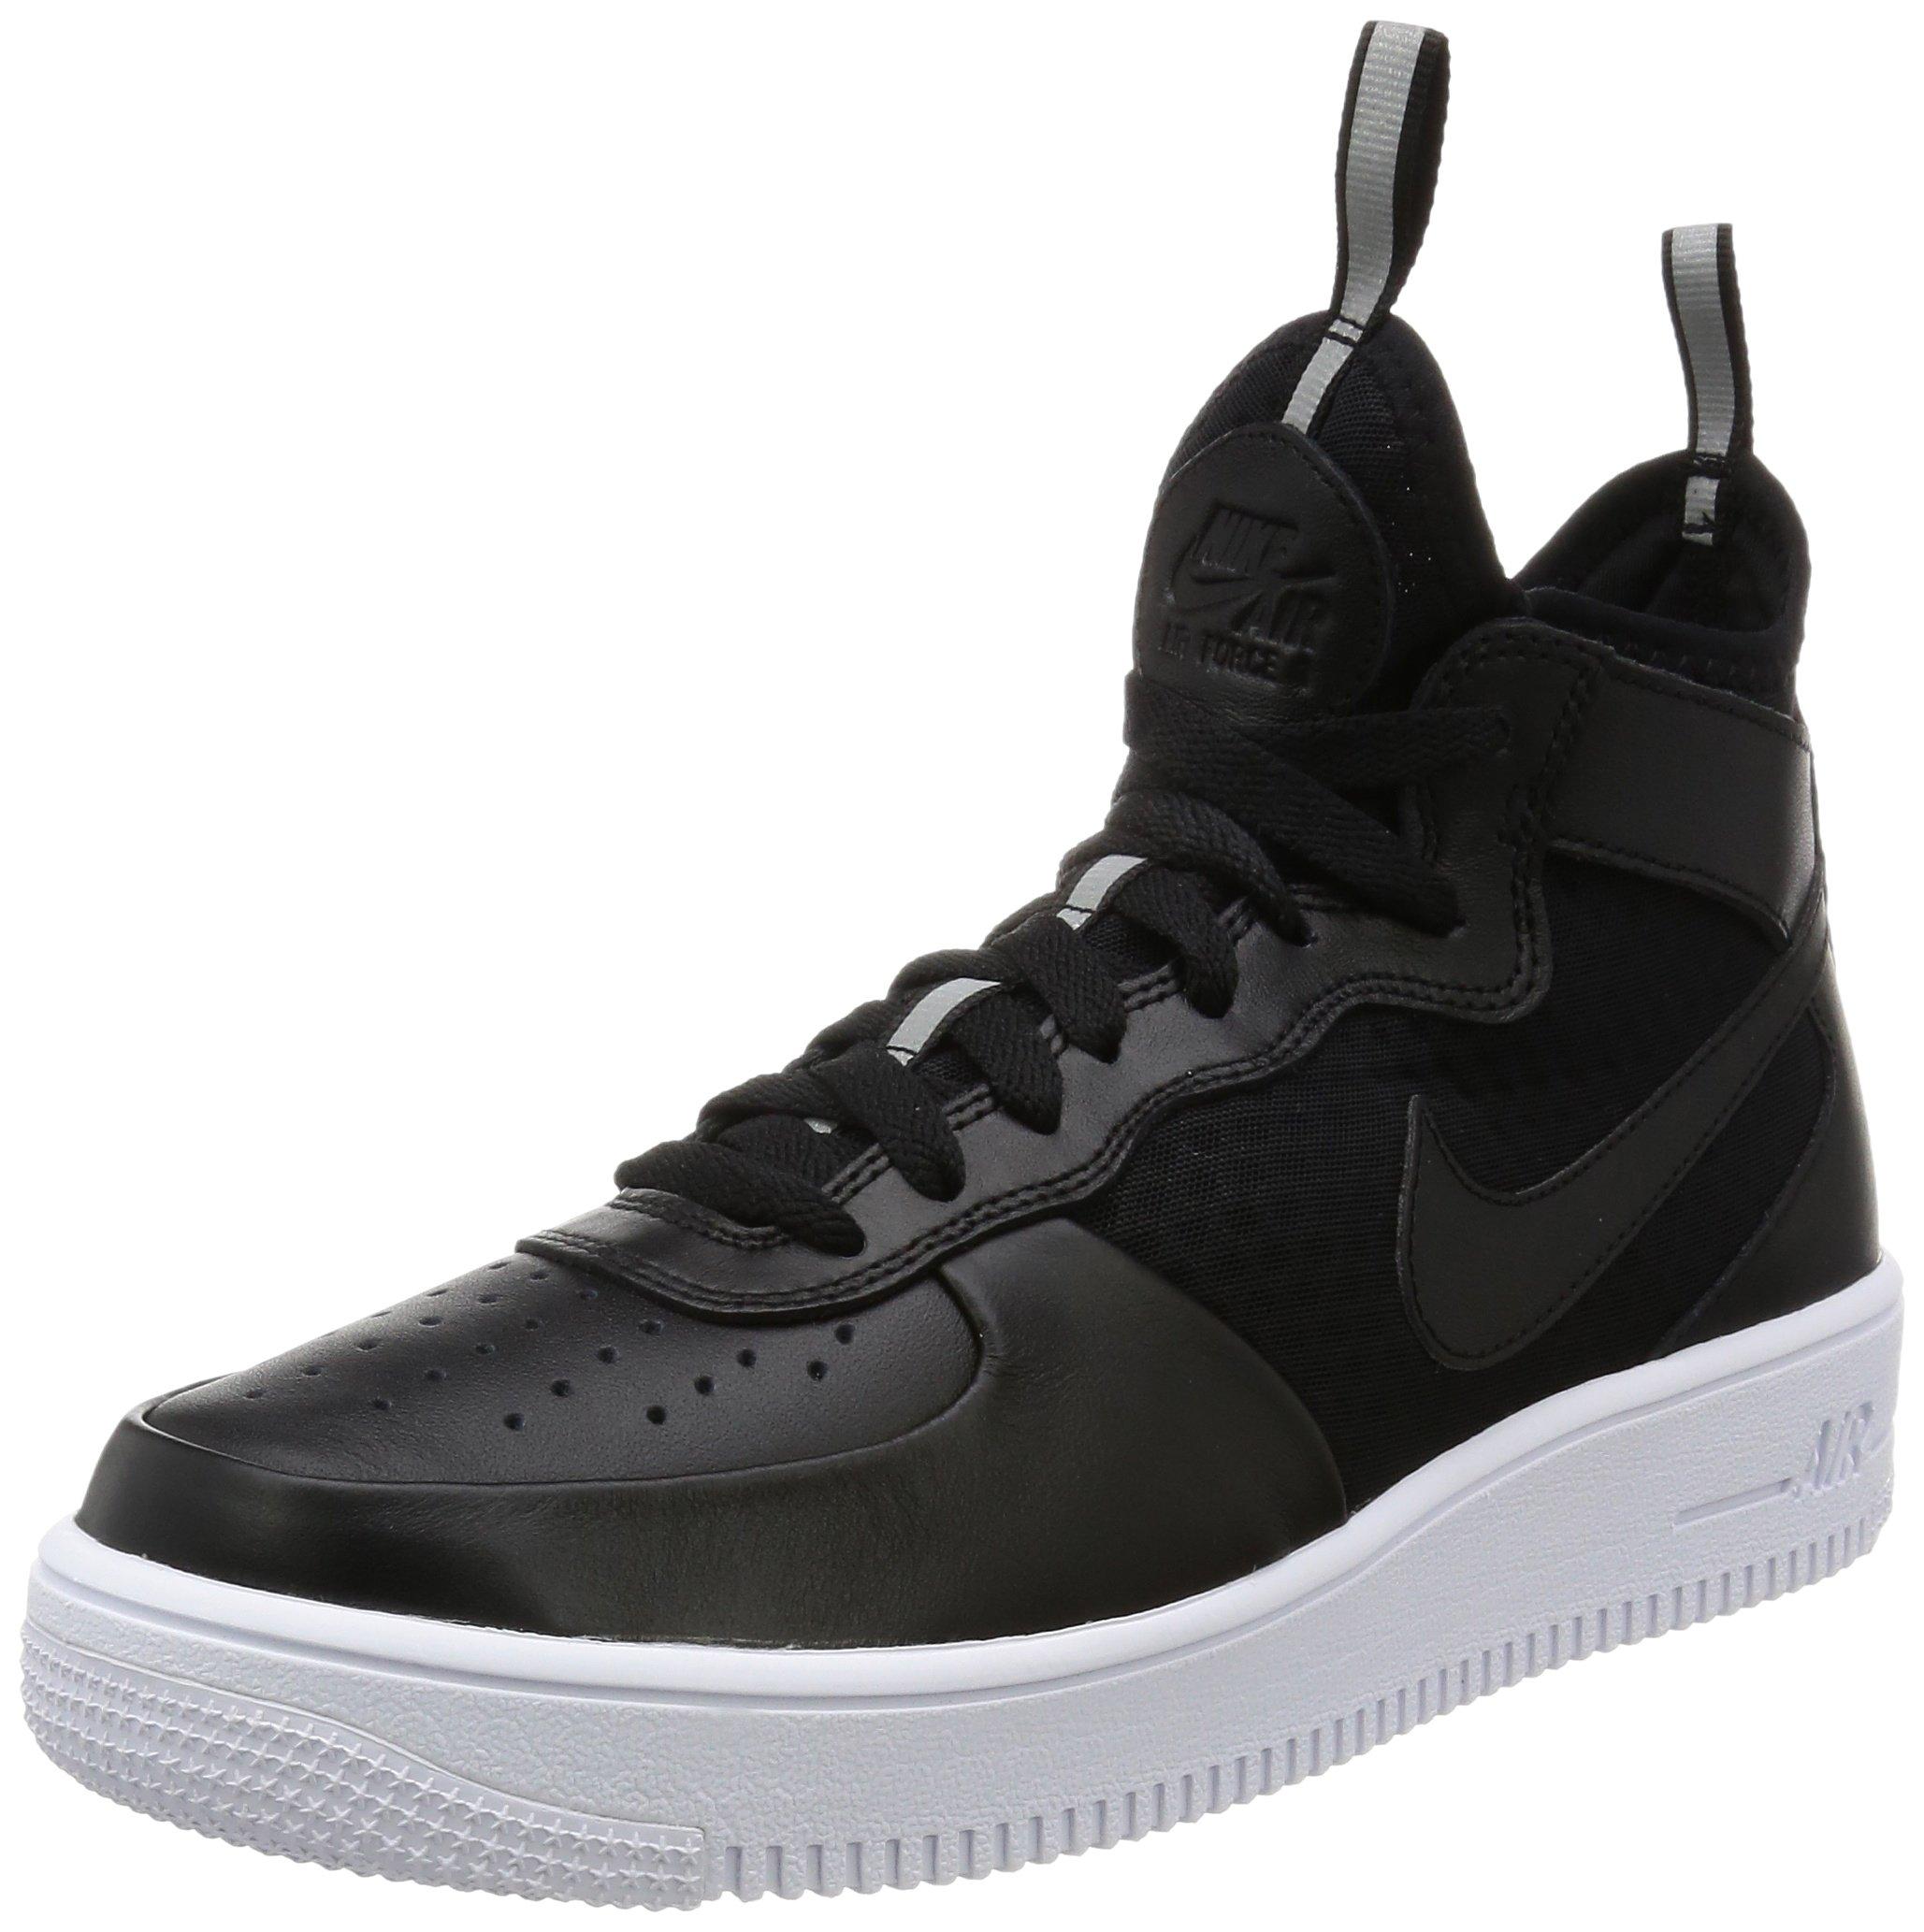 quality design 85d4c ef00c Galleon - Nike Mens Air Force 1 Ultraforce Mid Shoes Track  Black Black White 864014-001 Size 10